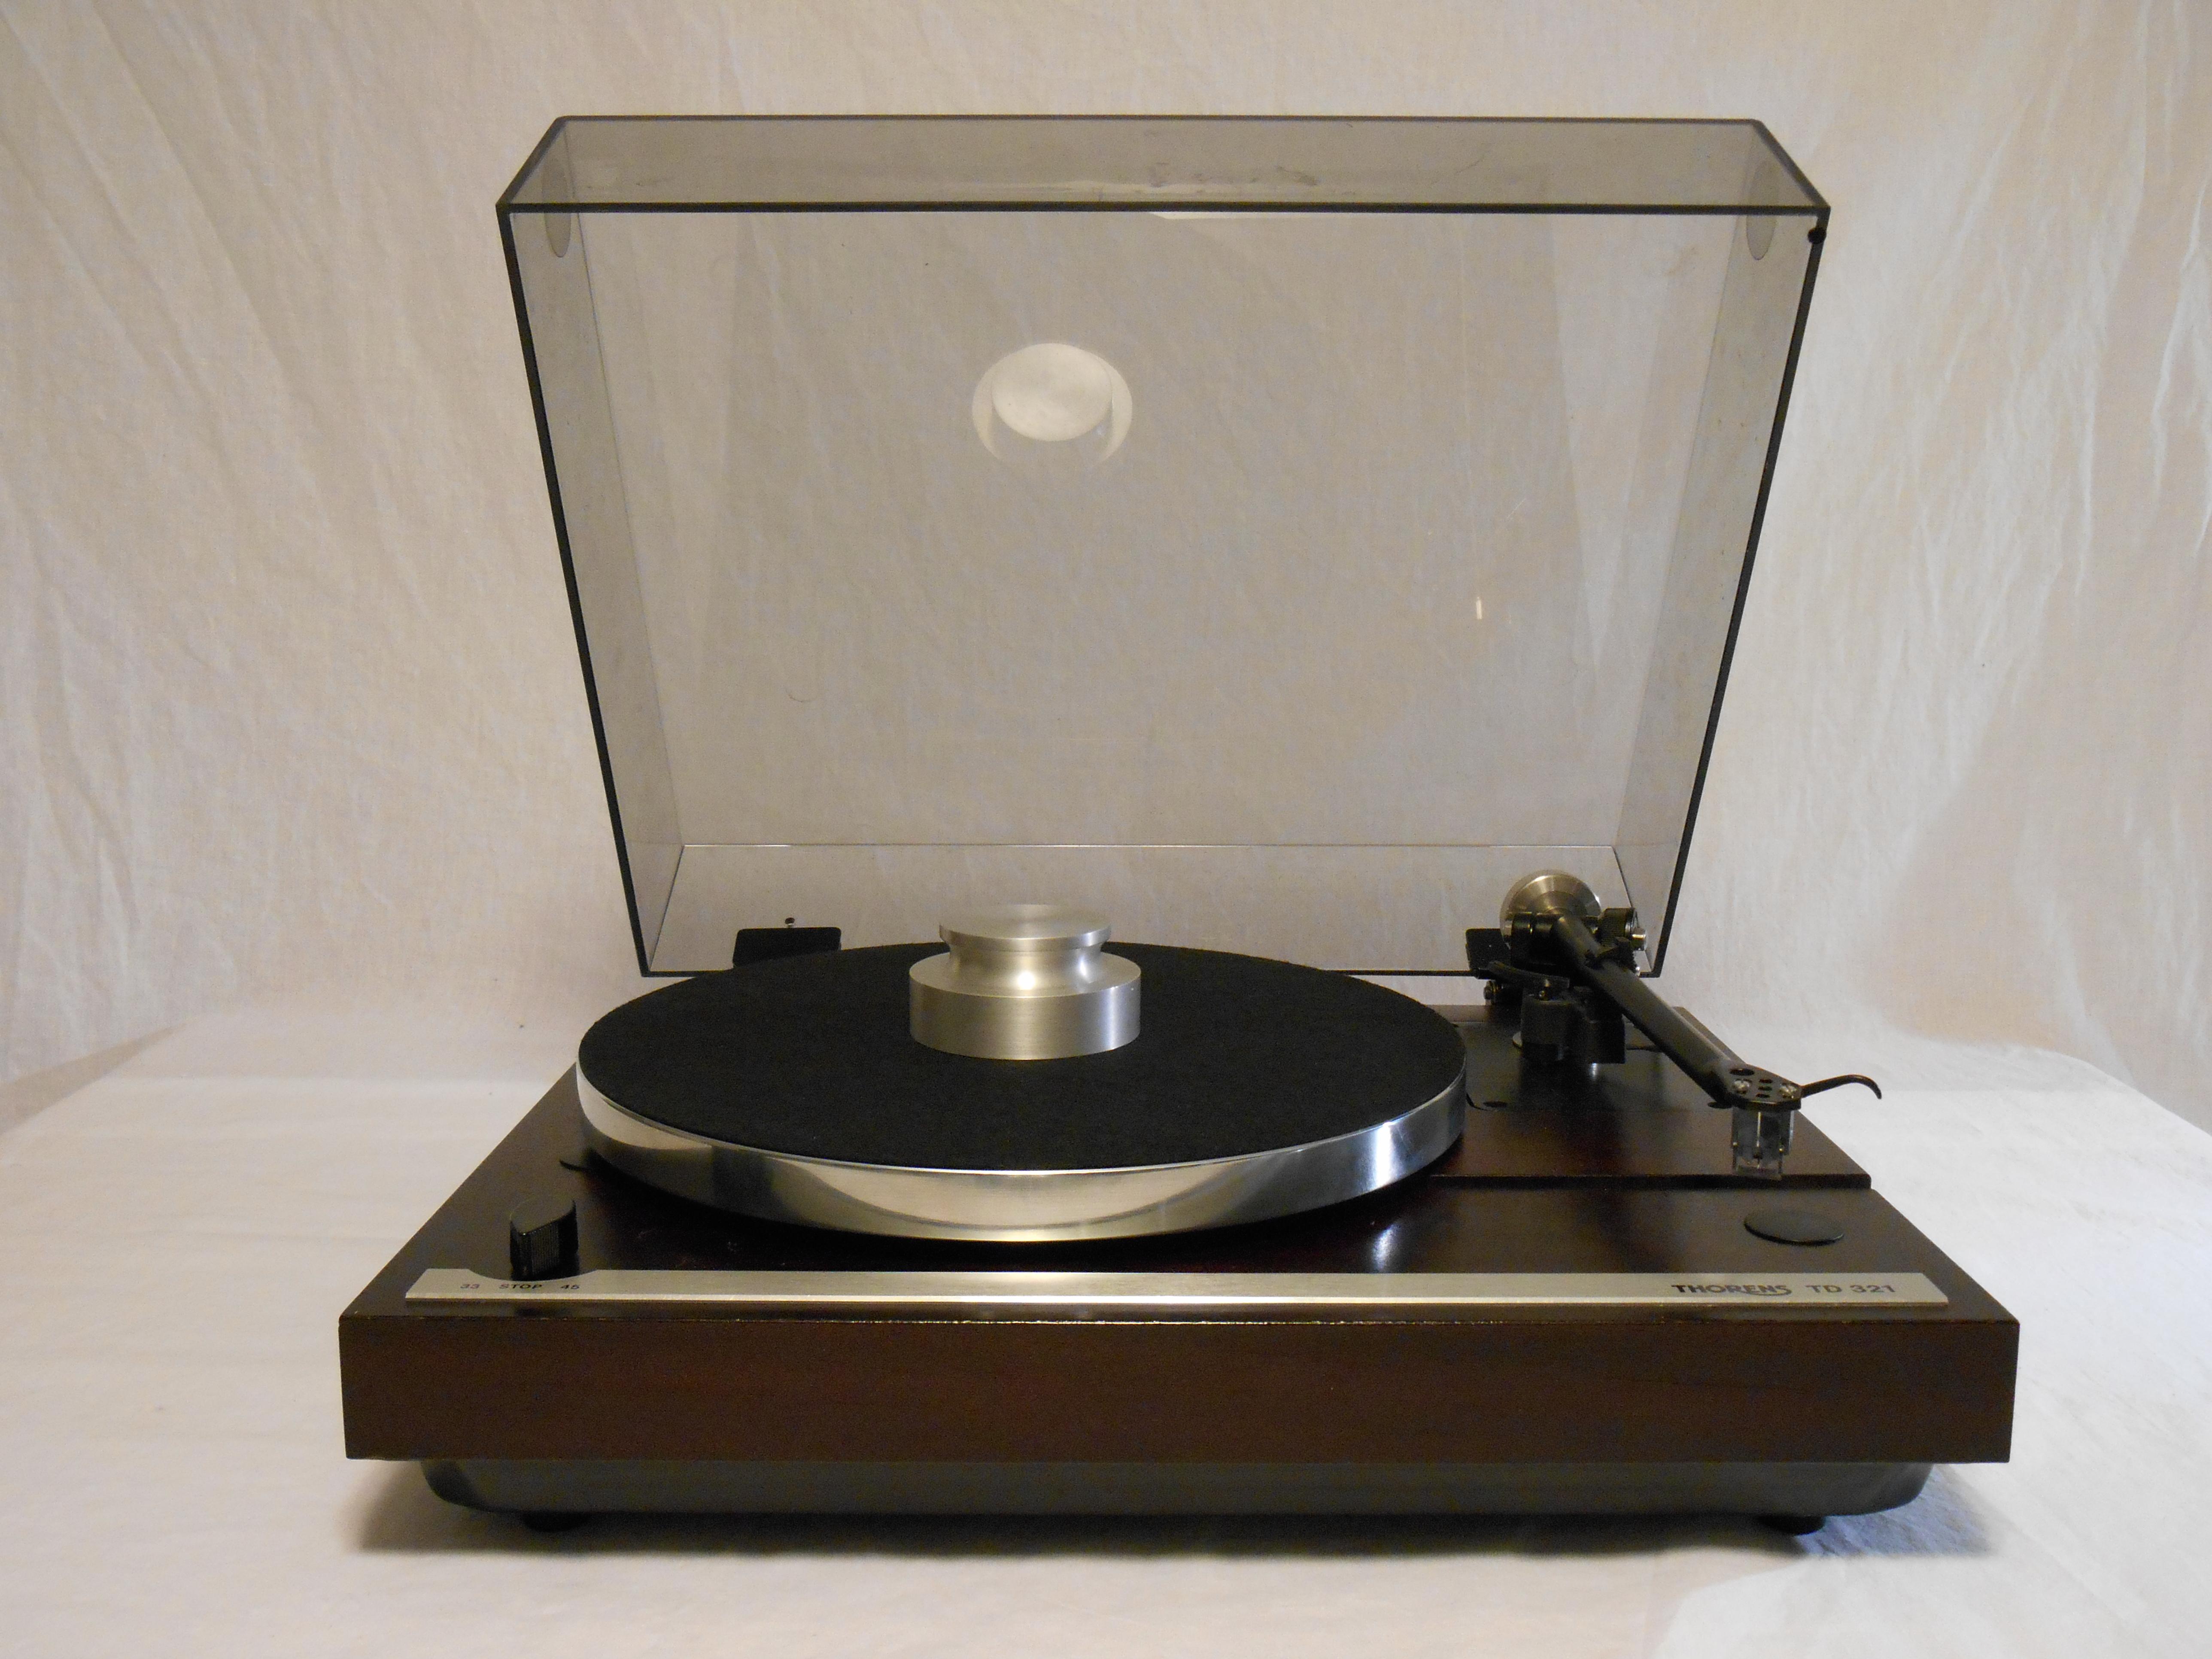 Superb Thorens Td 321 W Rega Rb 300 Vinyl Nirvana